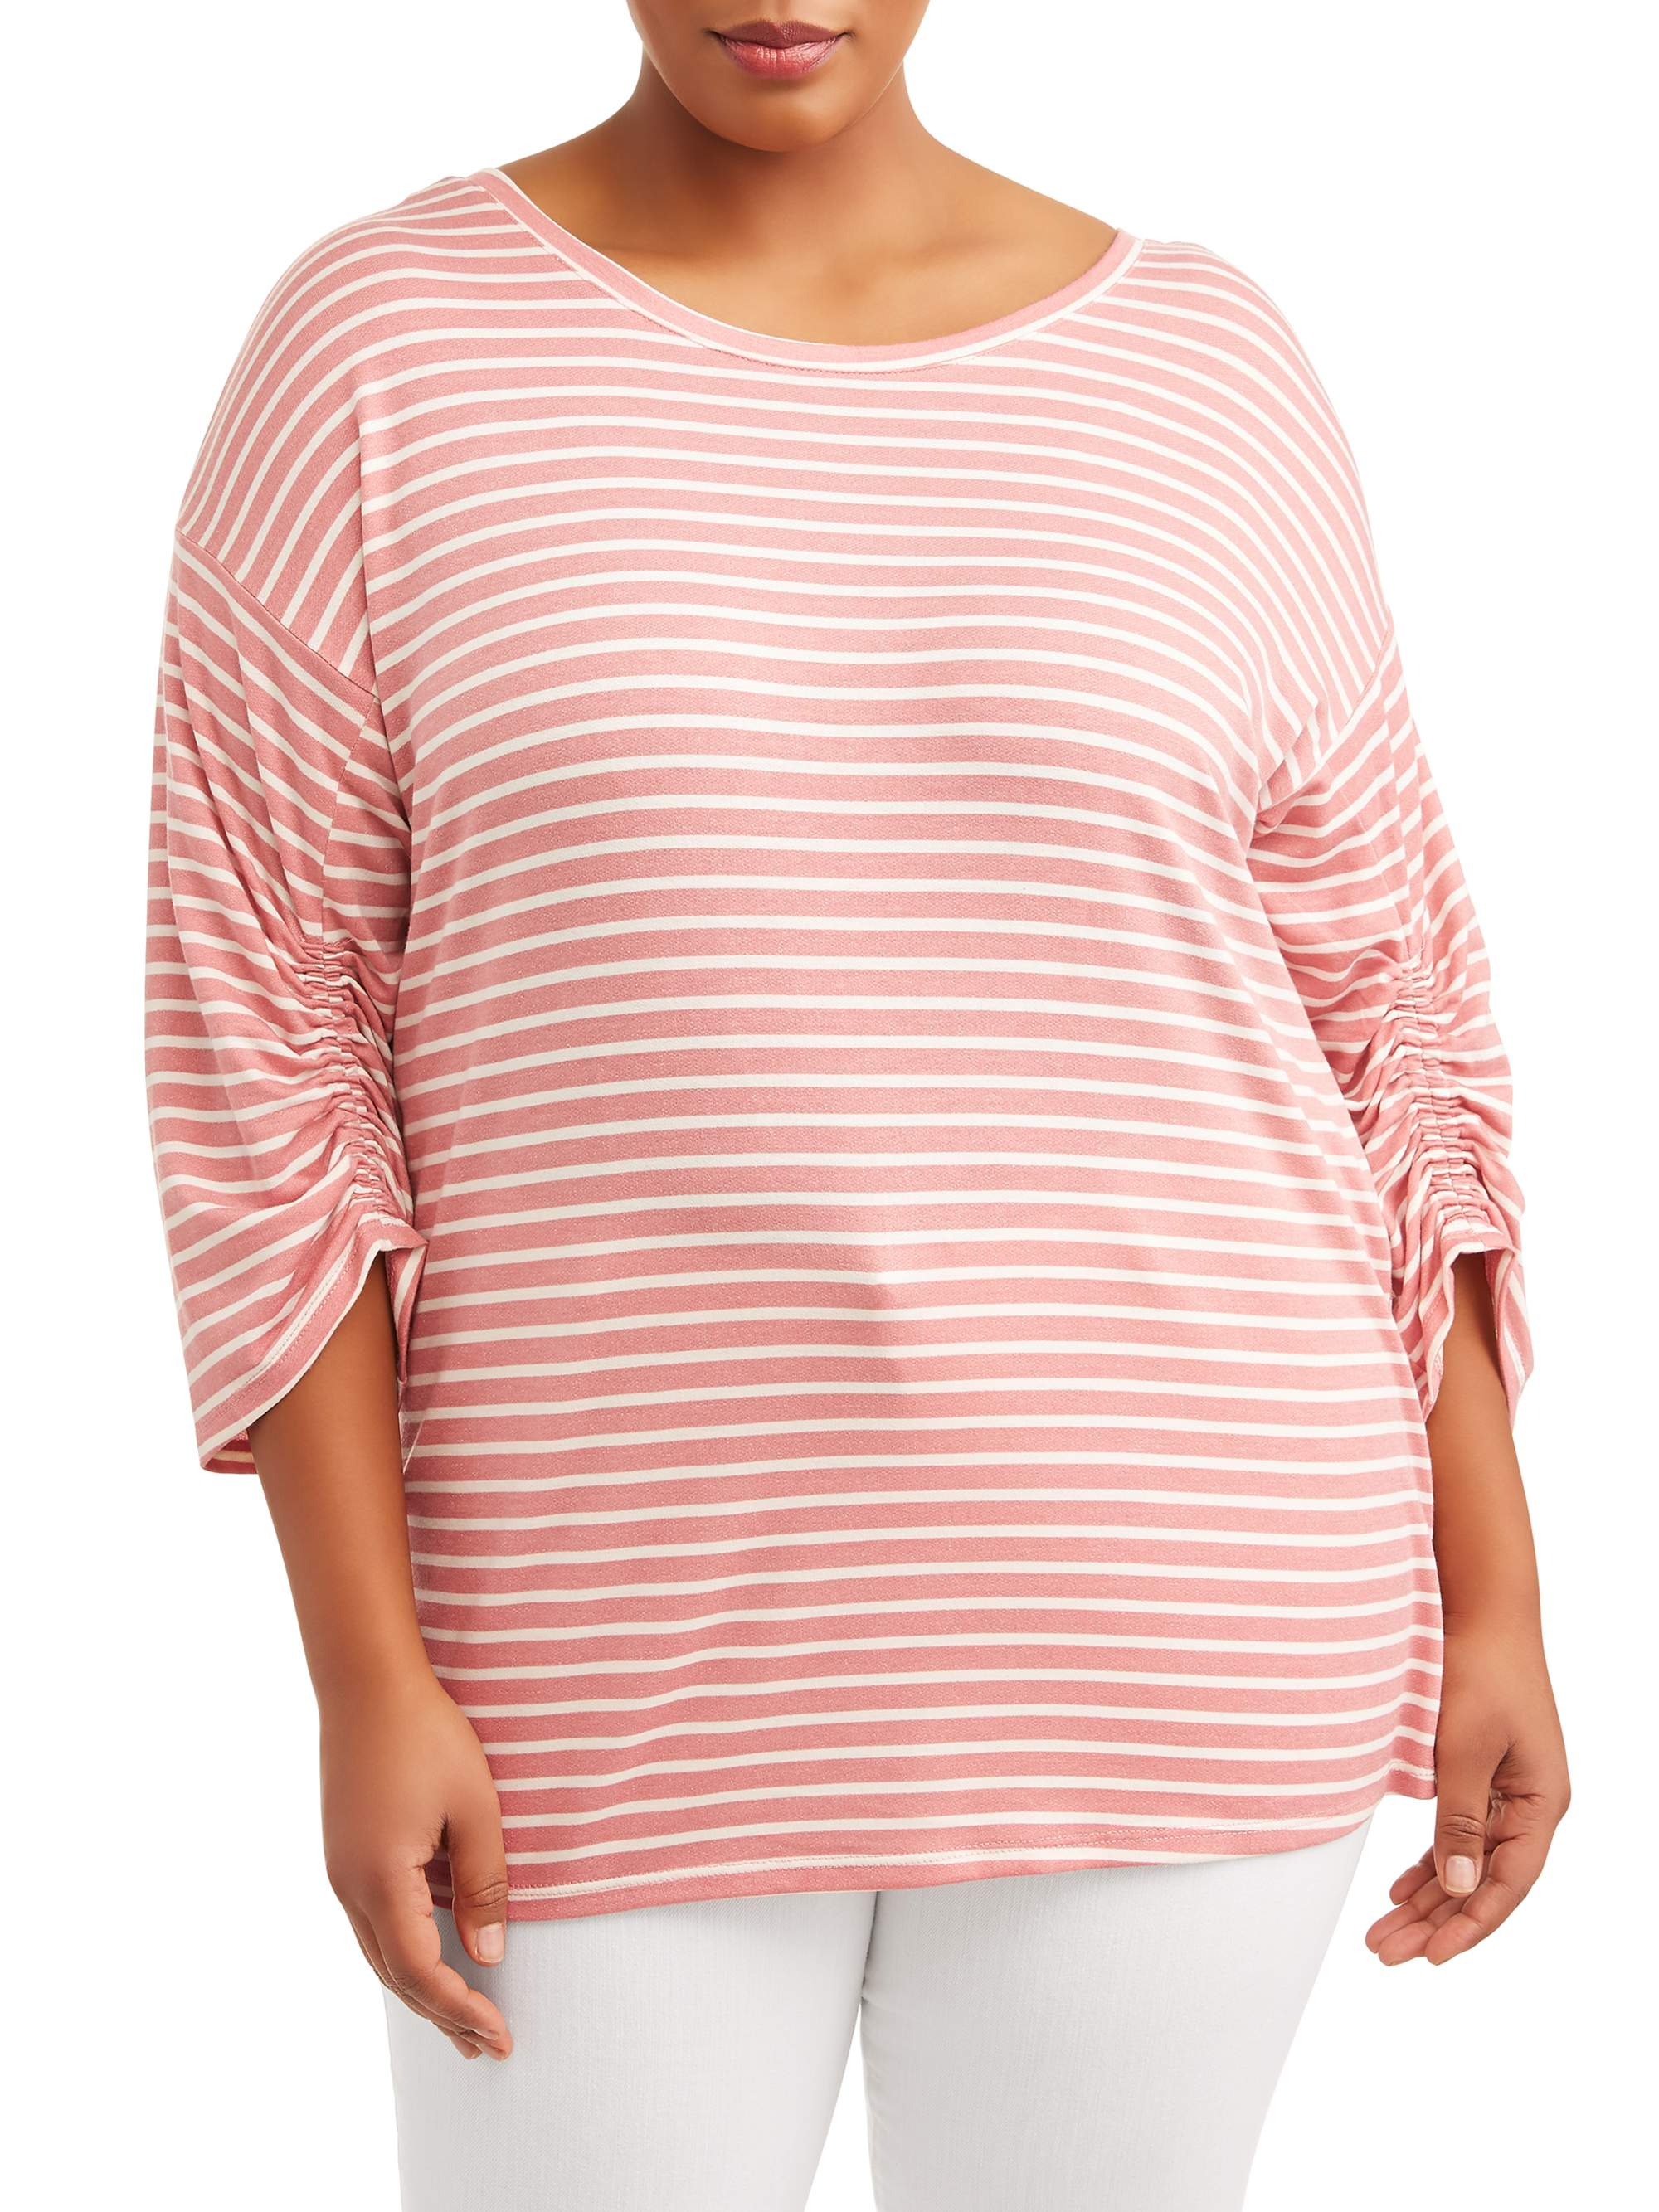 Como Blu Women's Plus Size Shirred Bubble Sleeve Top